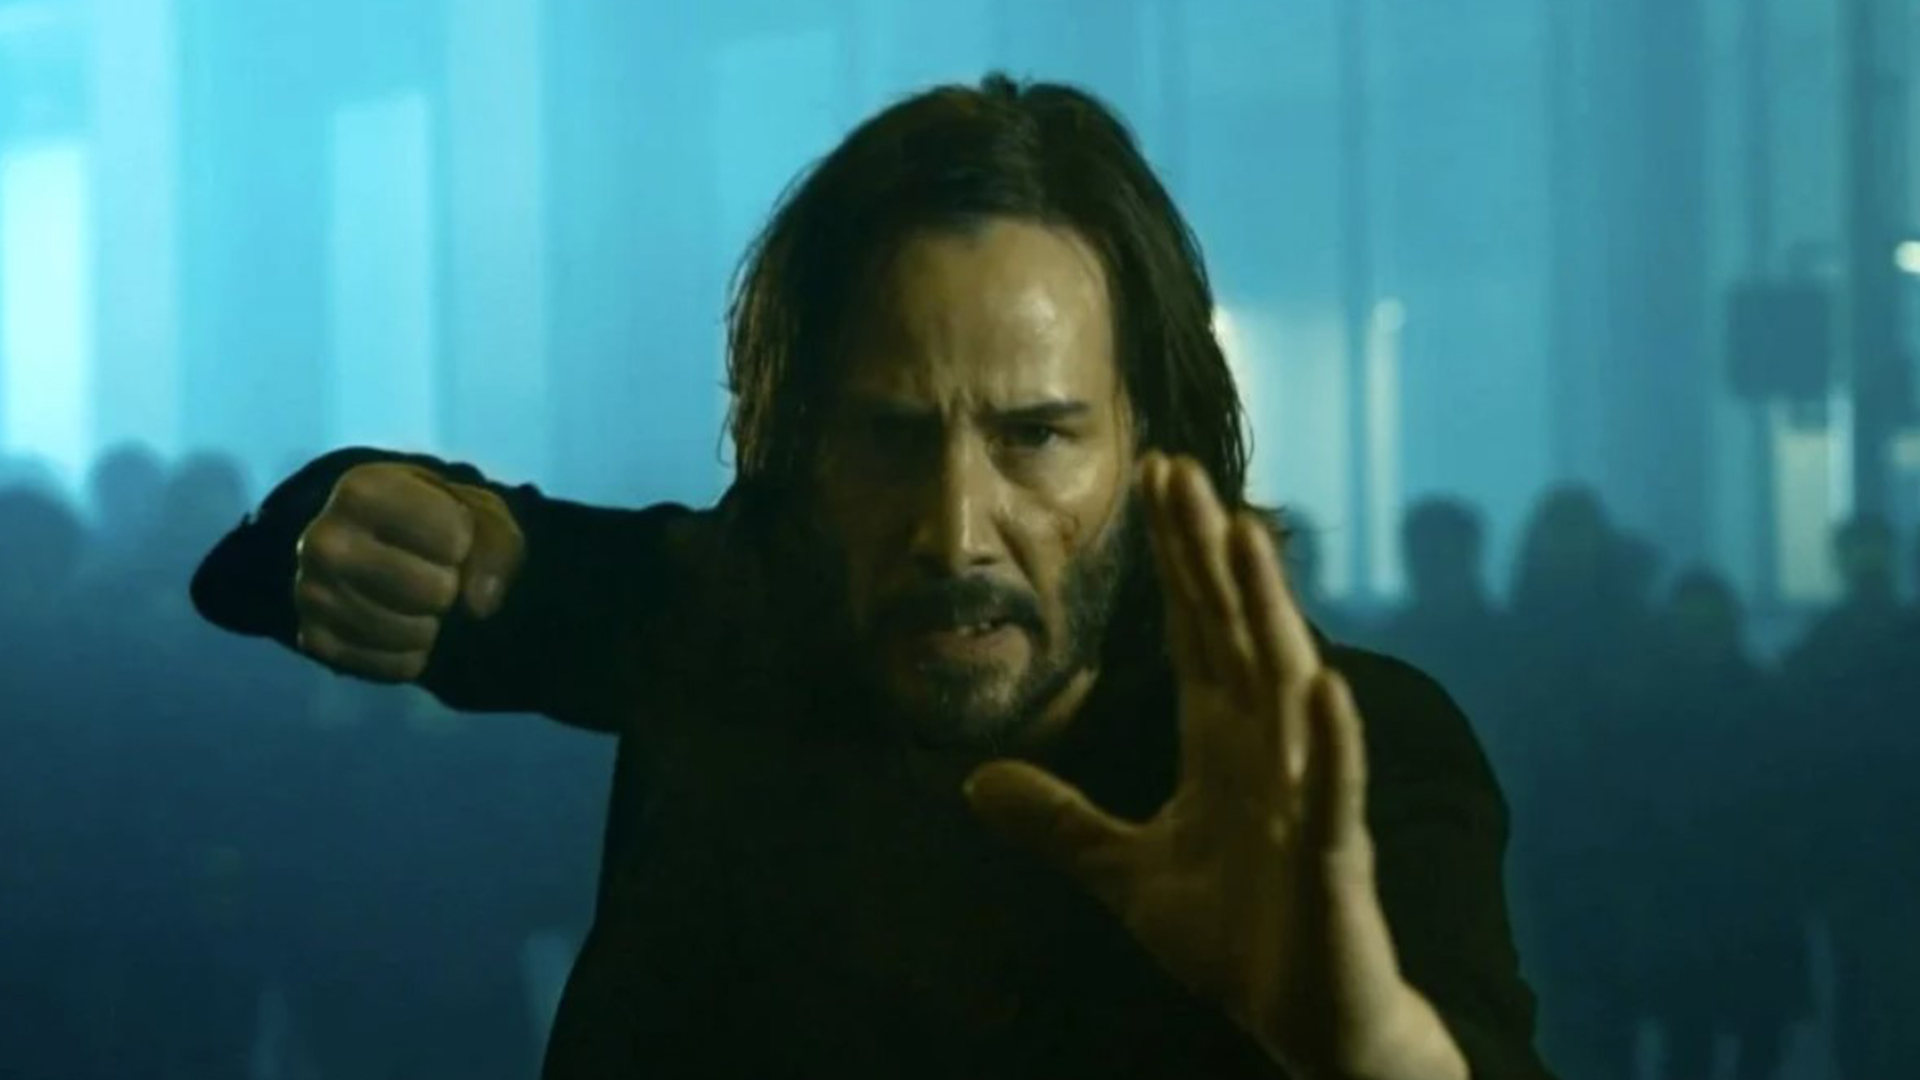 keanu reeves in Matrix - Neomag.